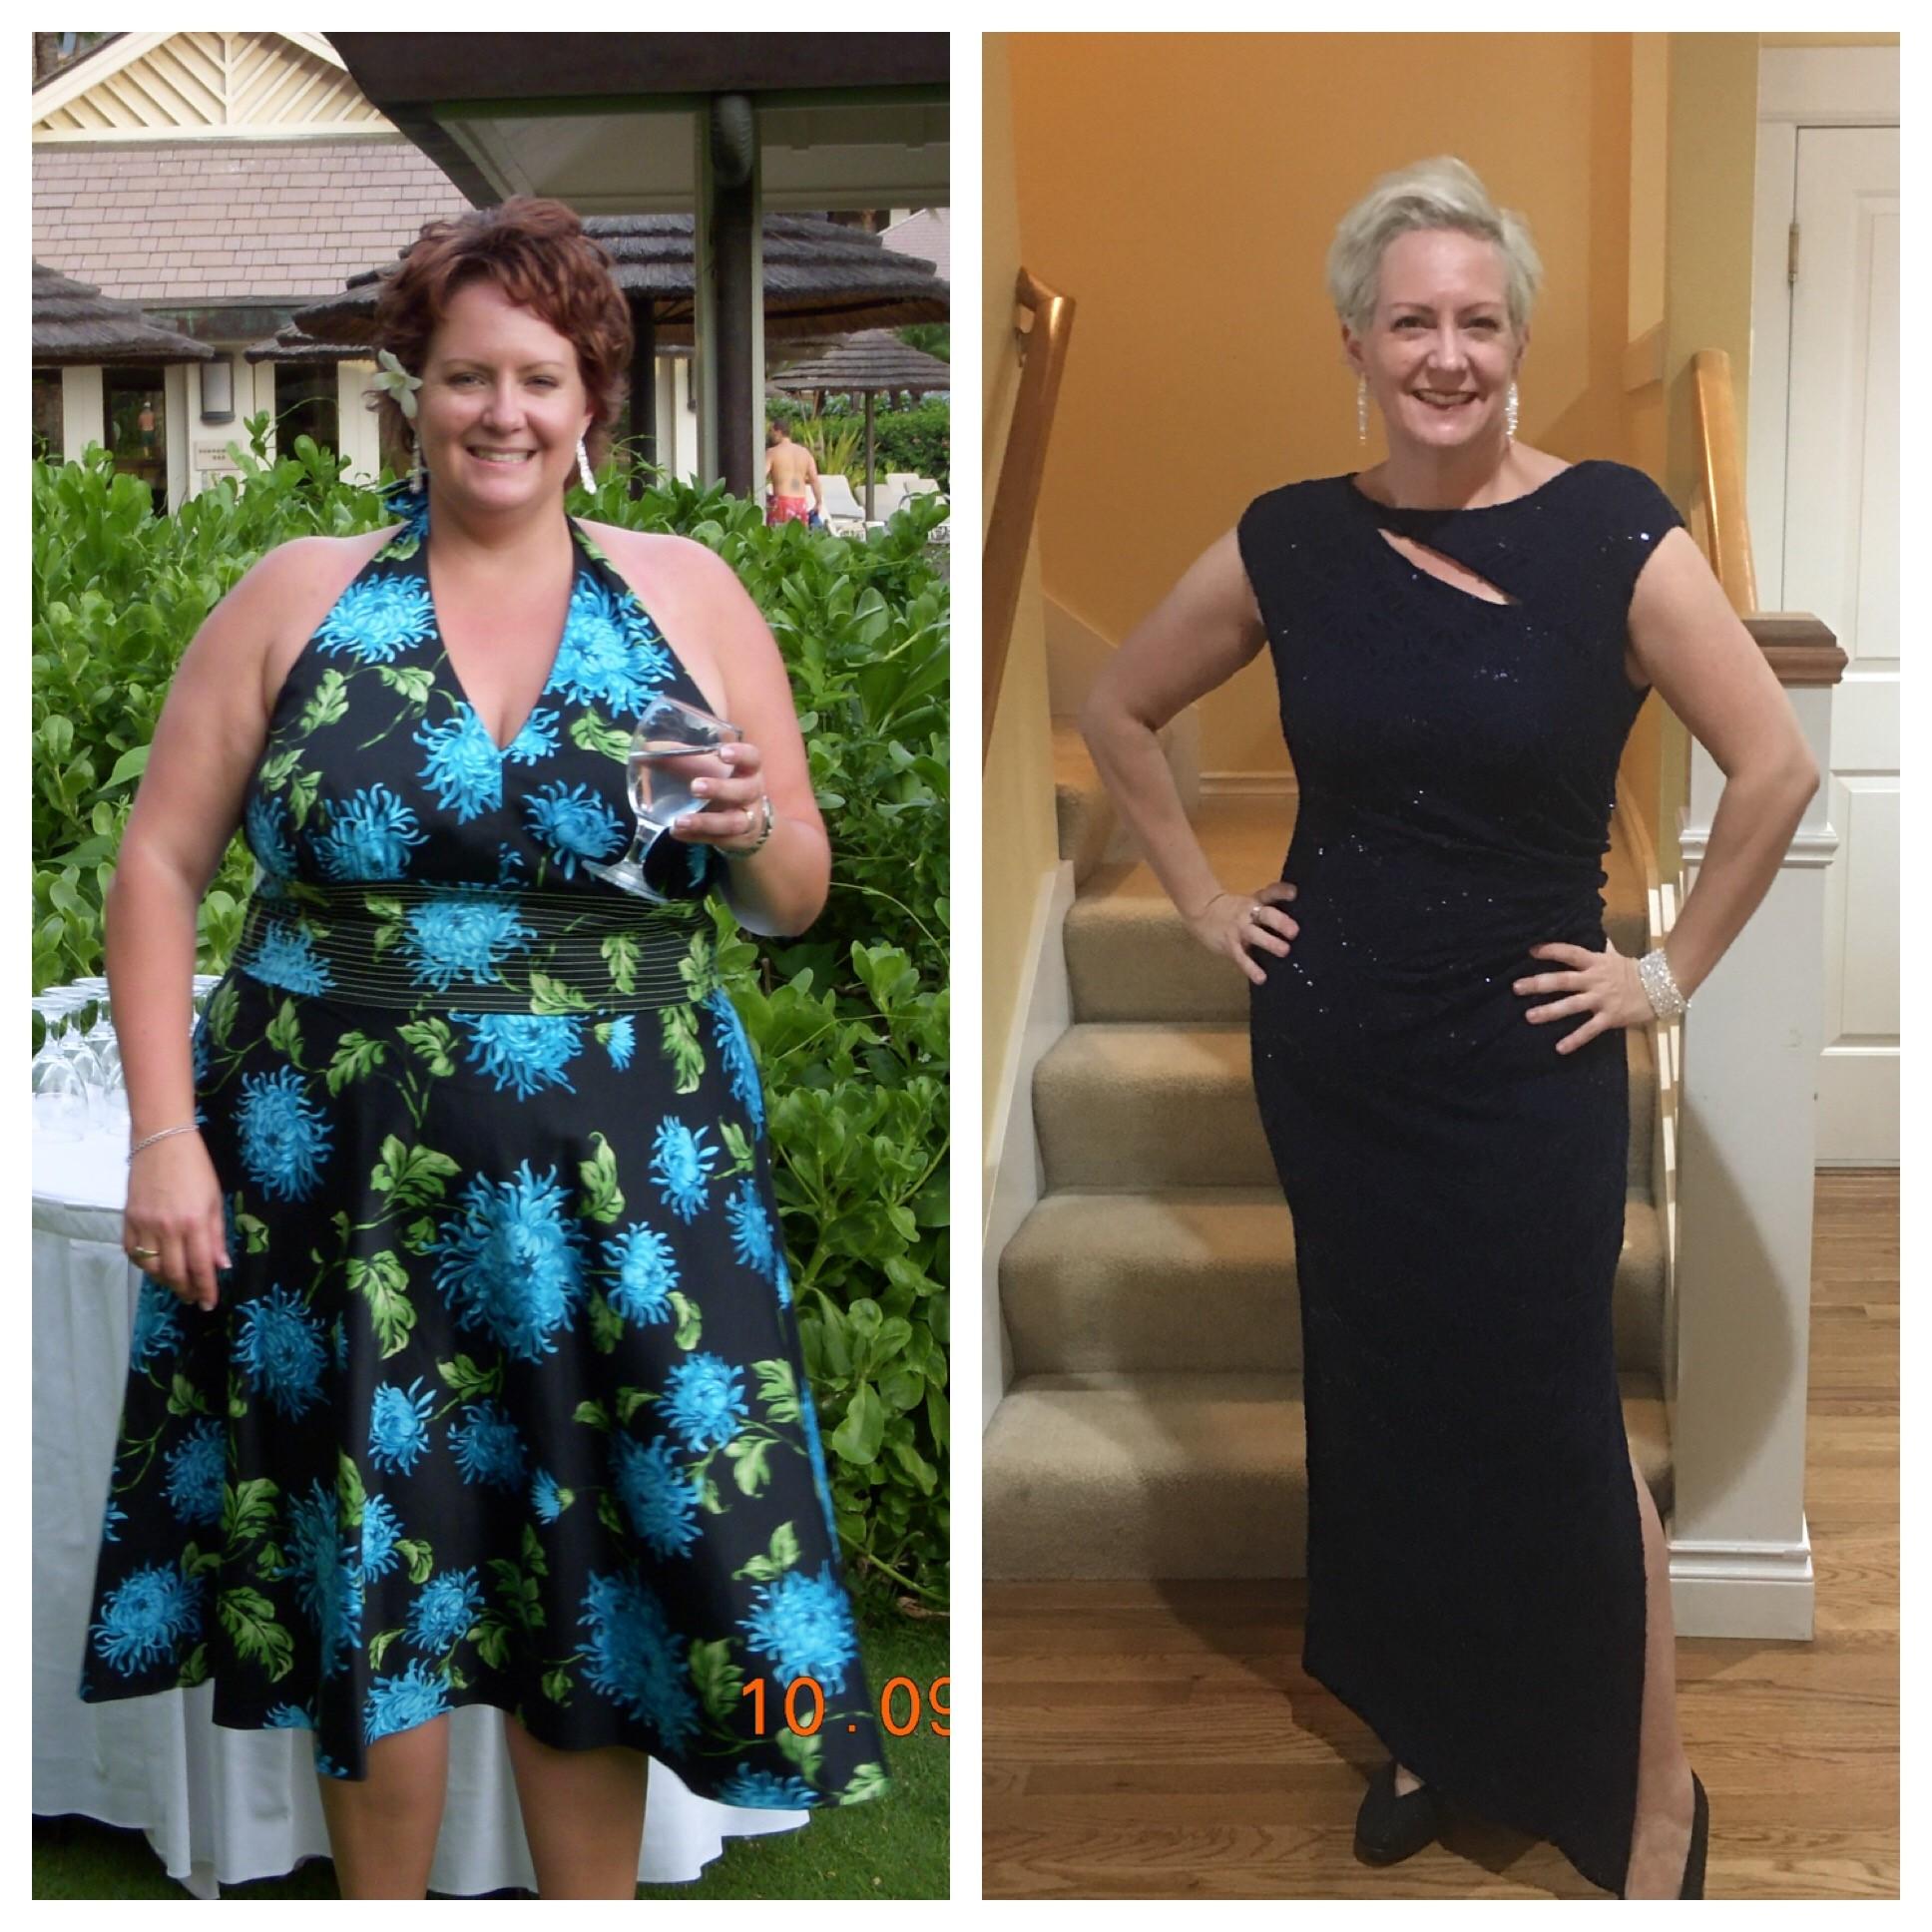 Maggie's amazing transformation!